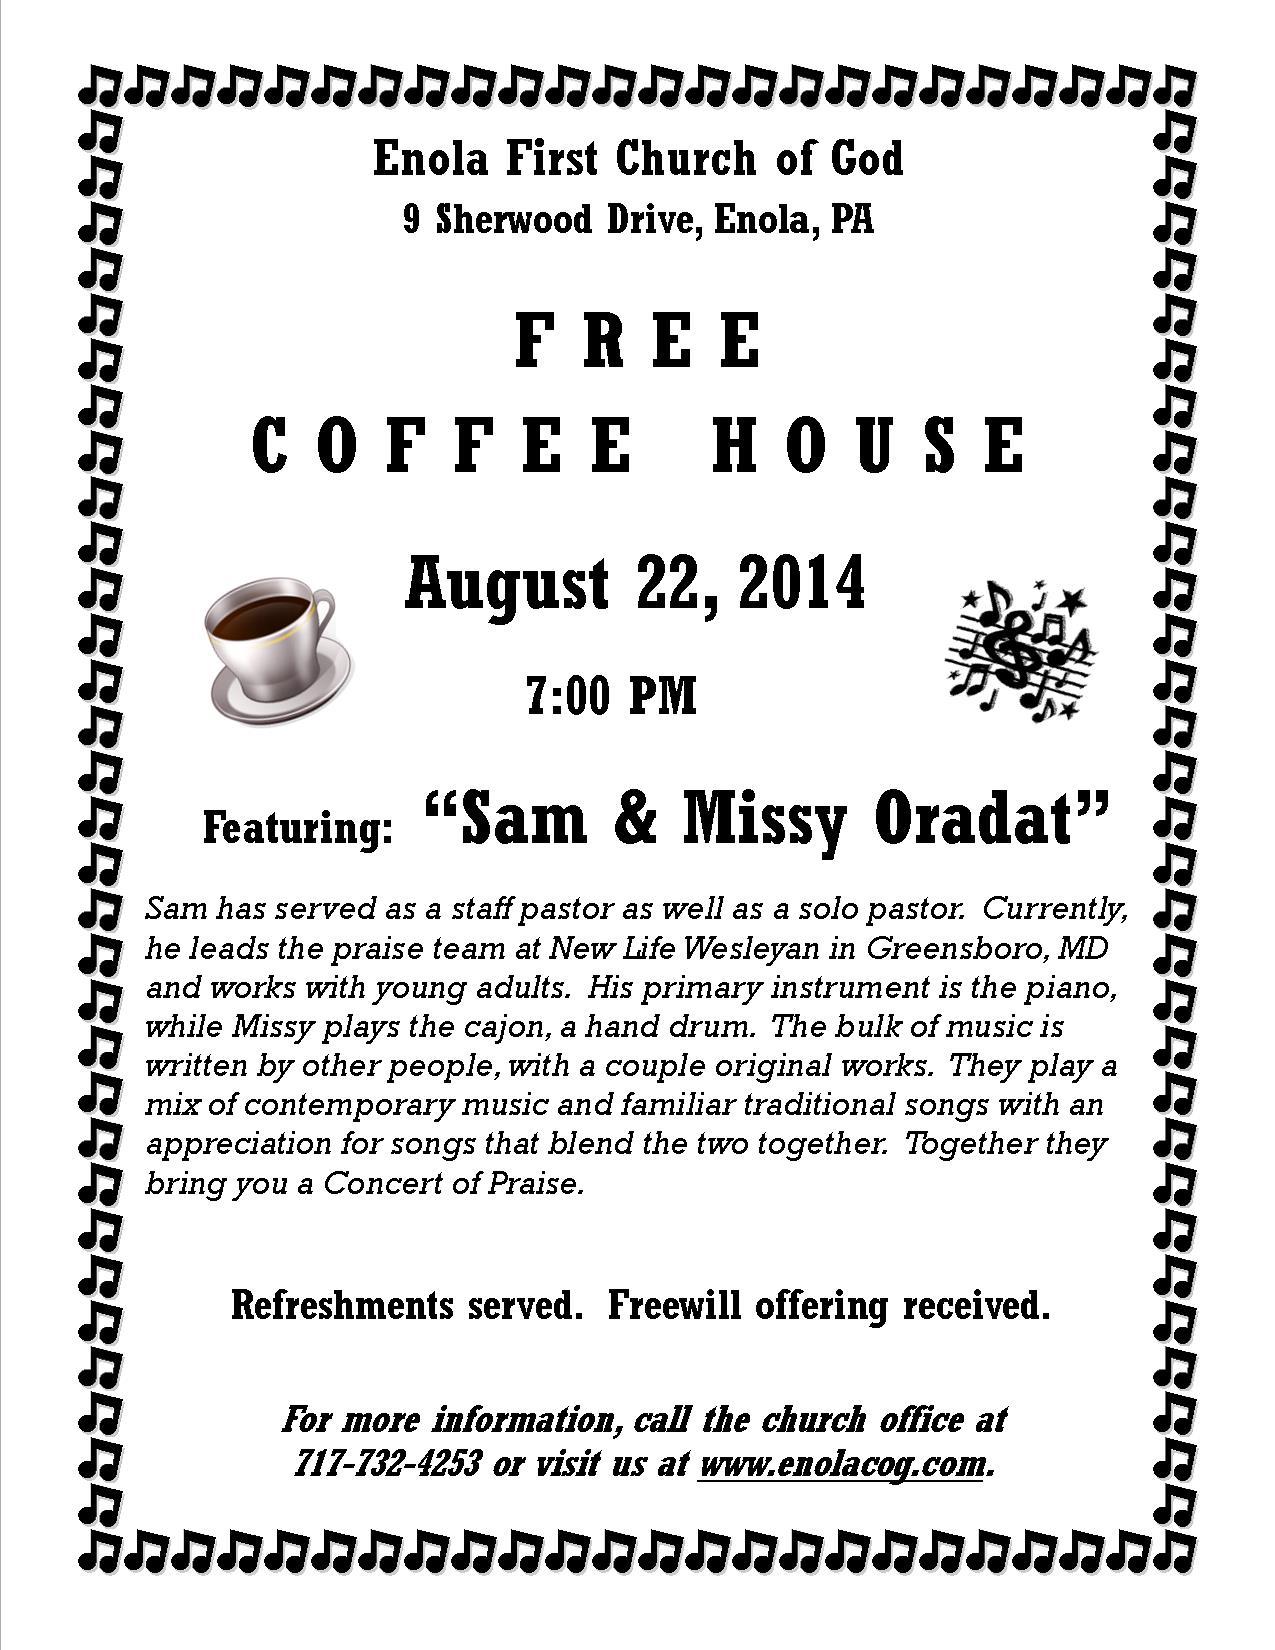 Coffee House Flyer - Sam Oradat - August 2014